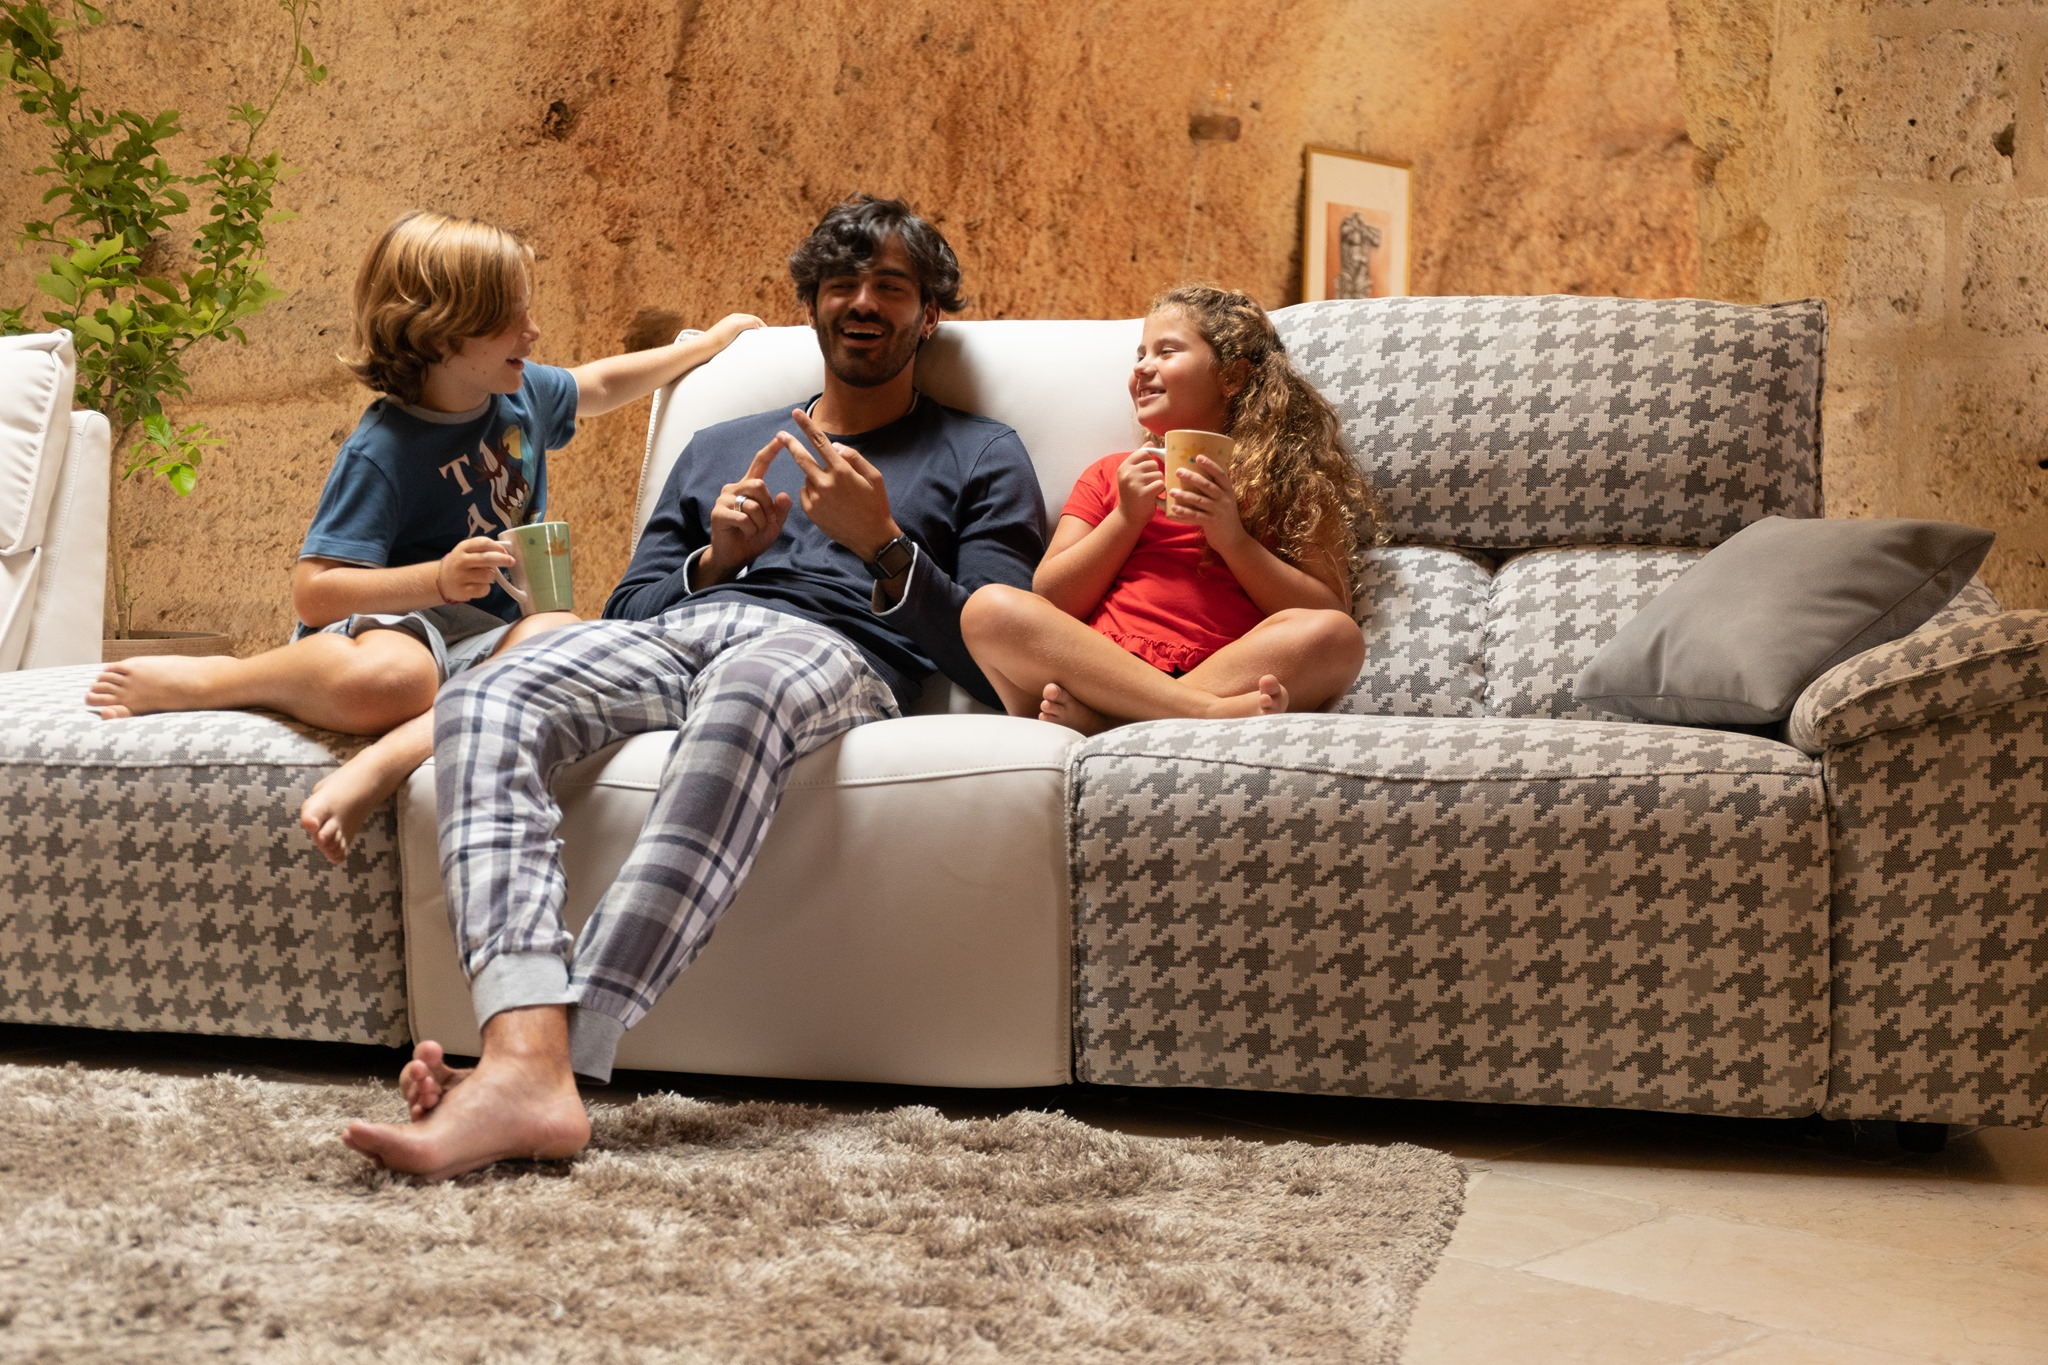 papa con bambini sul divano